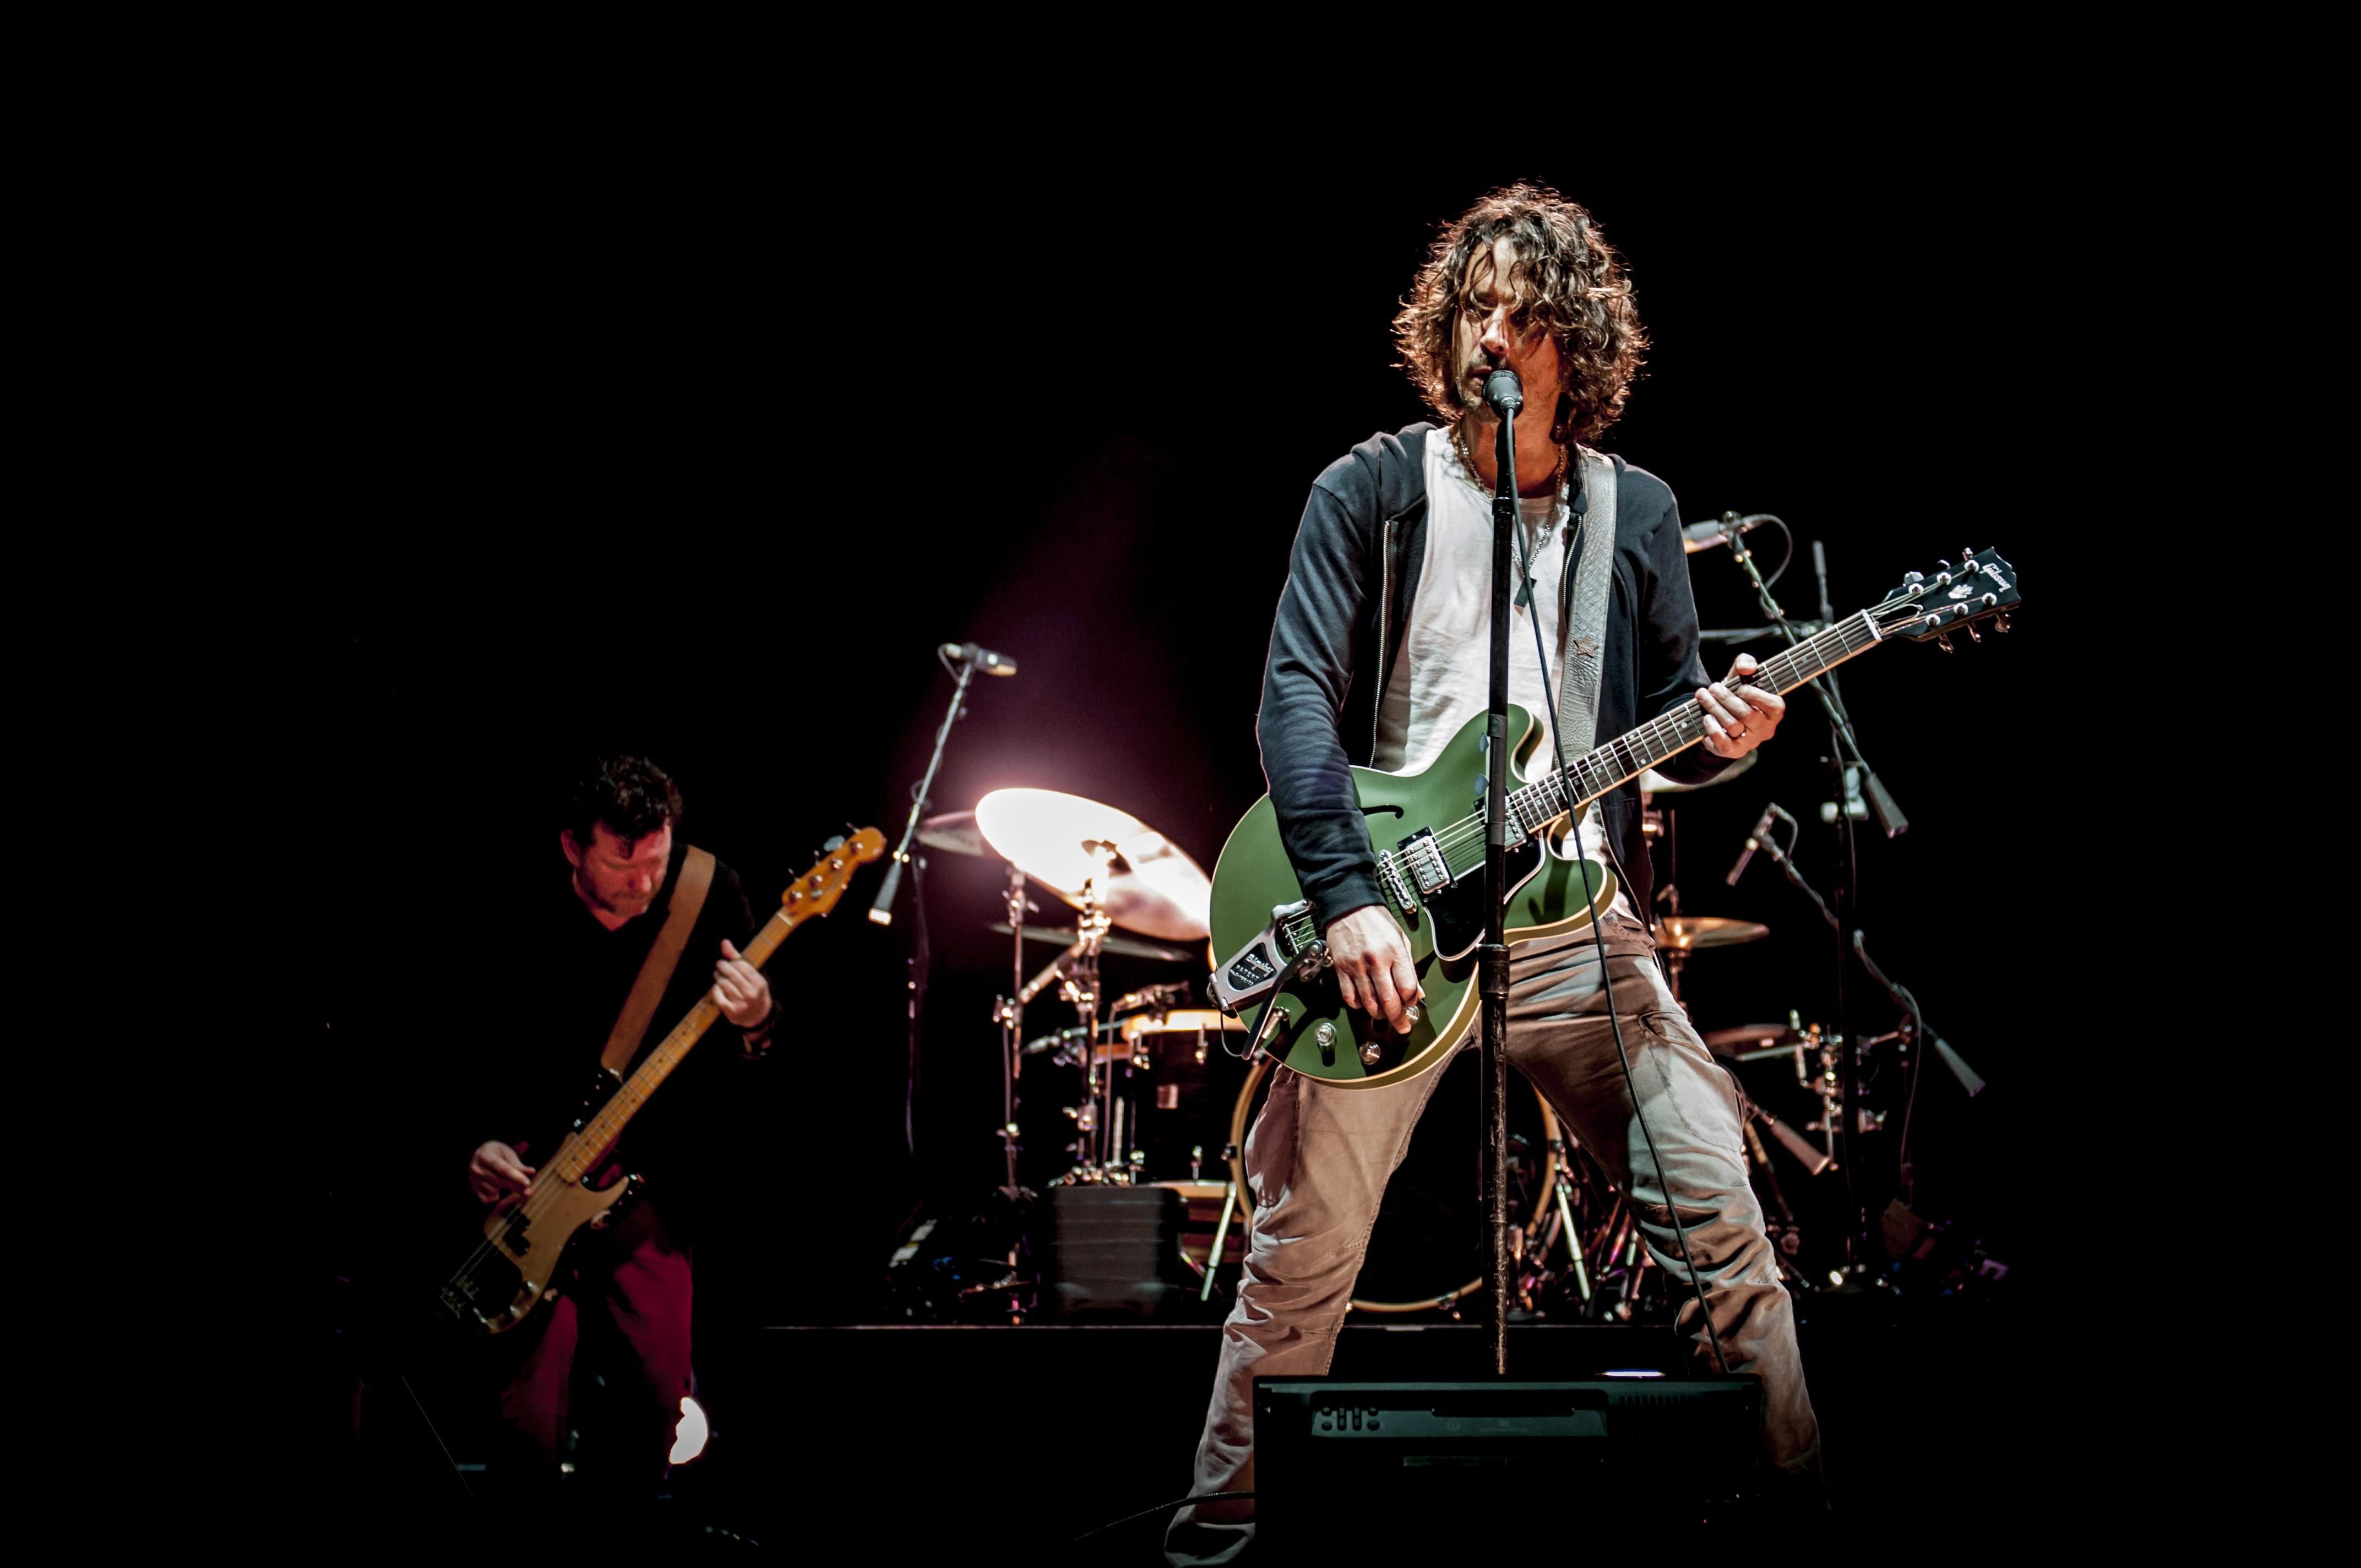 Chris Cornell's Wife is Suing Soundgarden